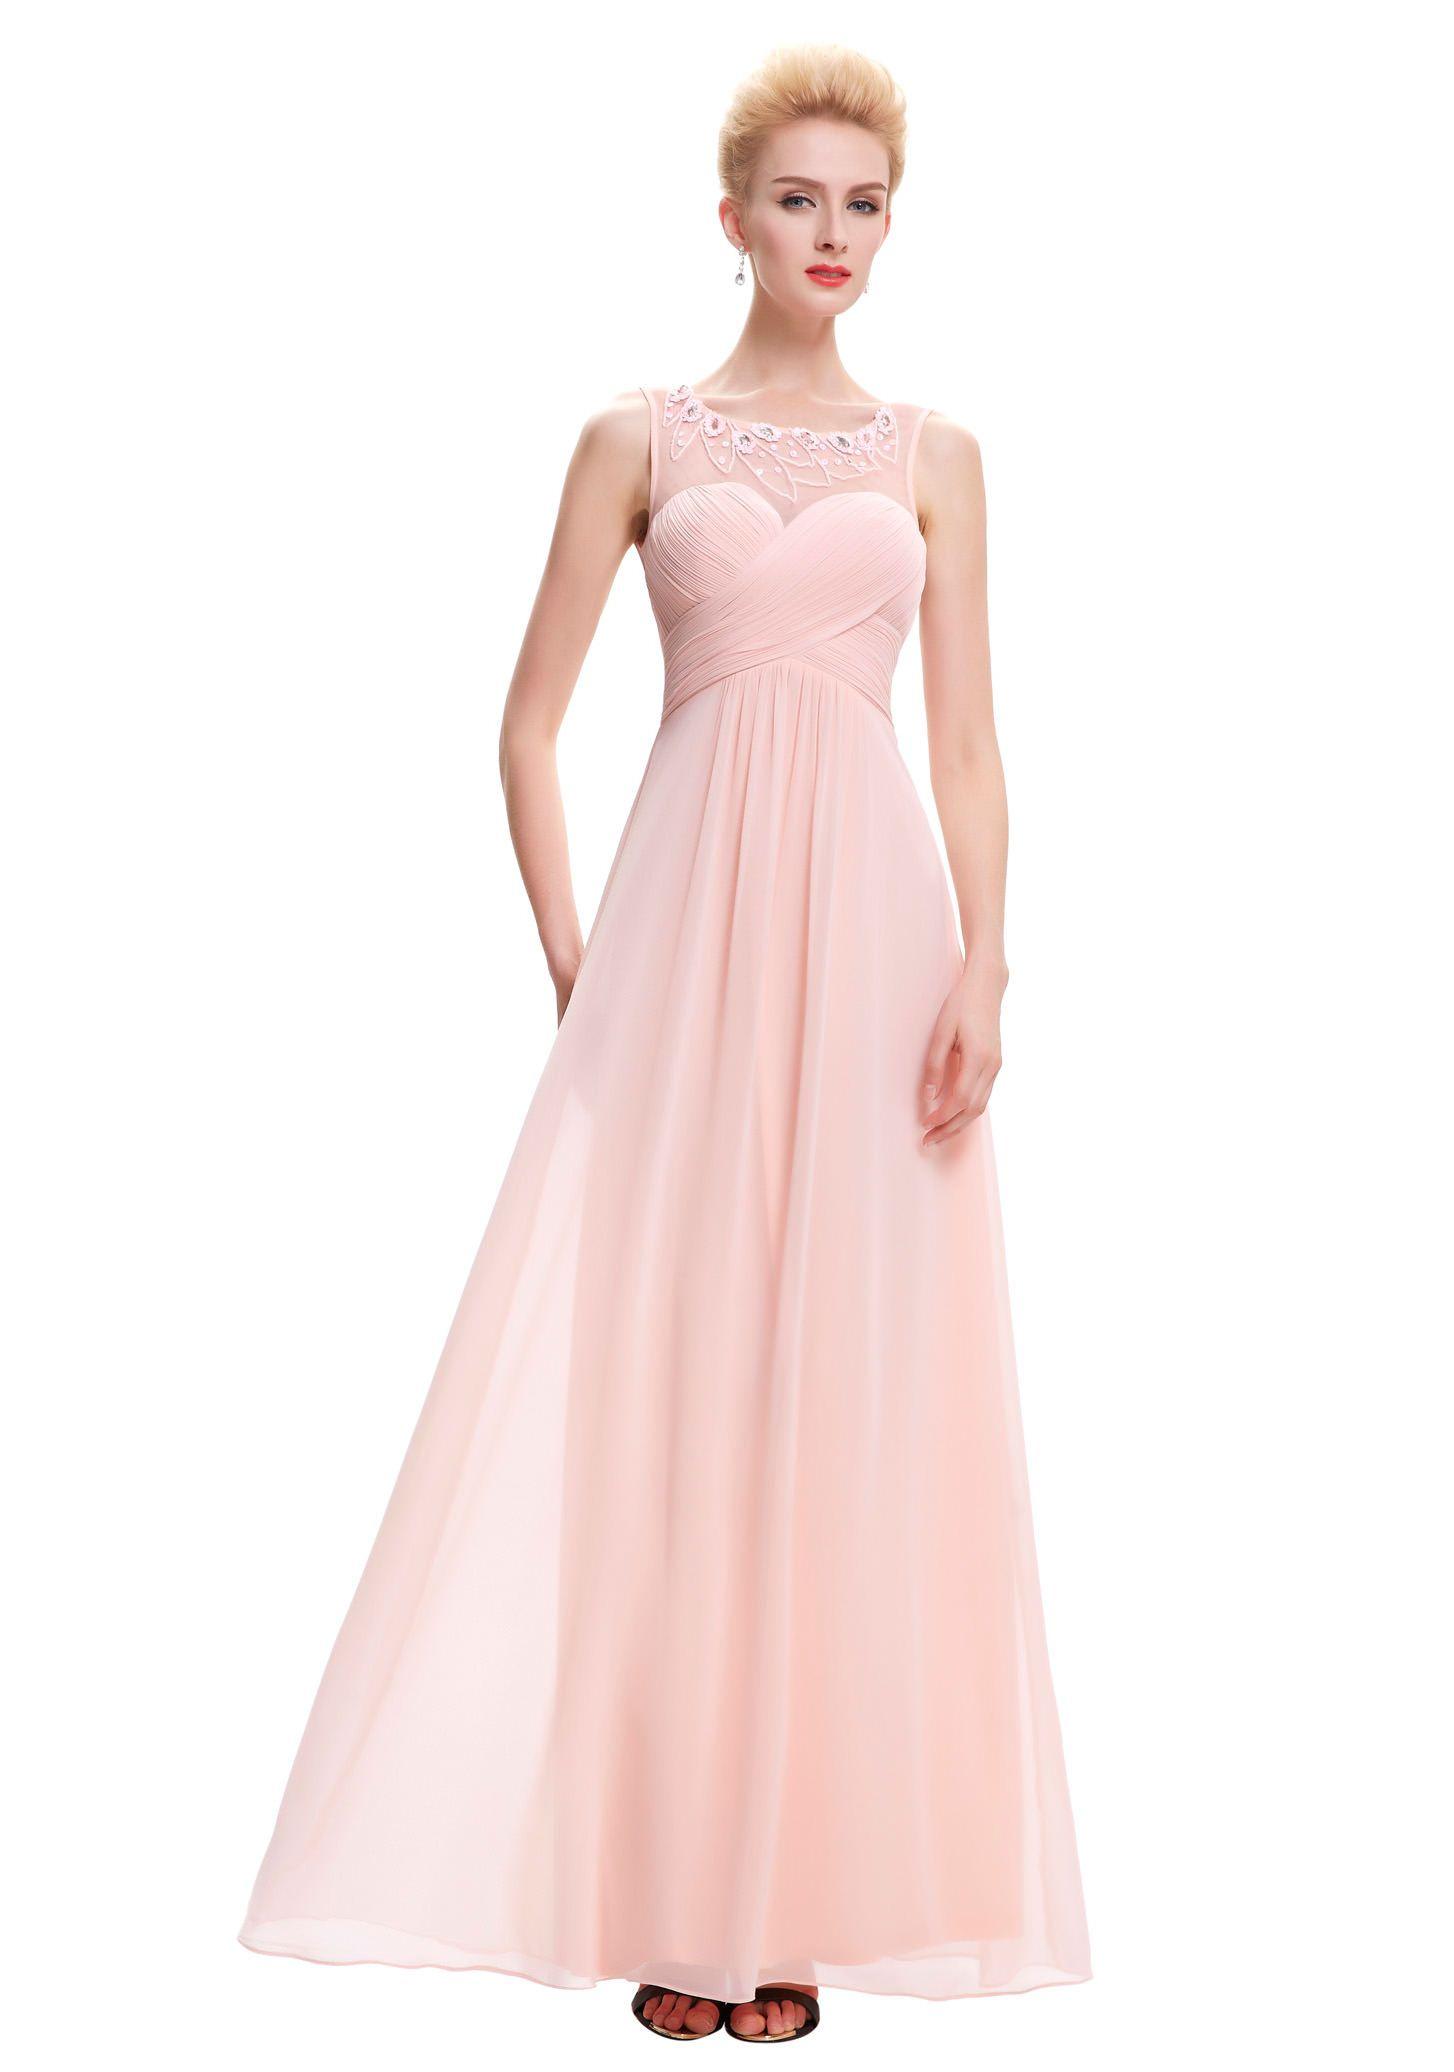 Langes Chiffon Abendkleid in Rosa | Abendkleid, Elegante ...